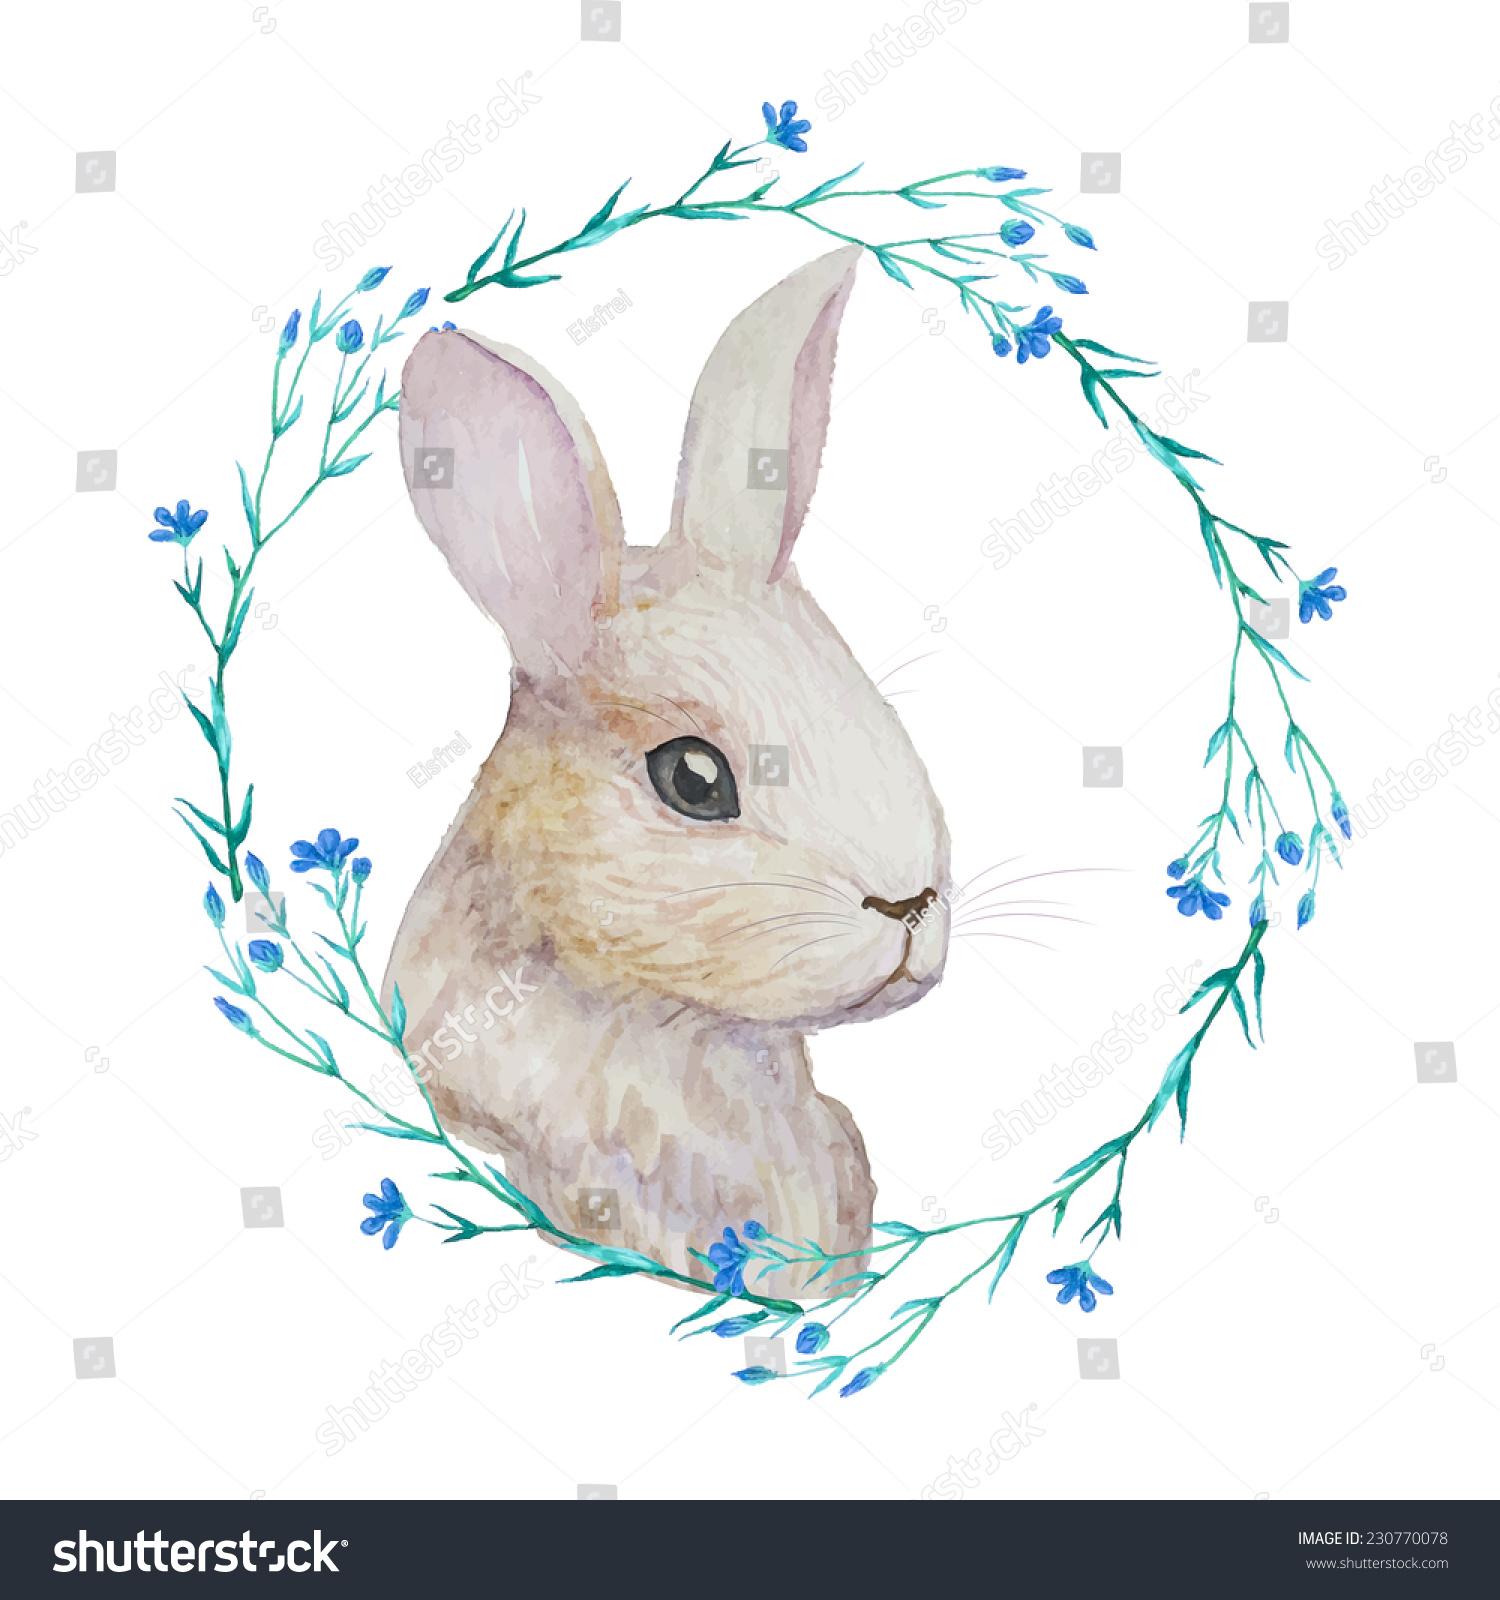 Realistic rabbit illustration - photo#12